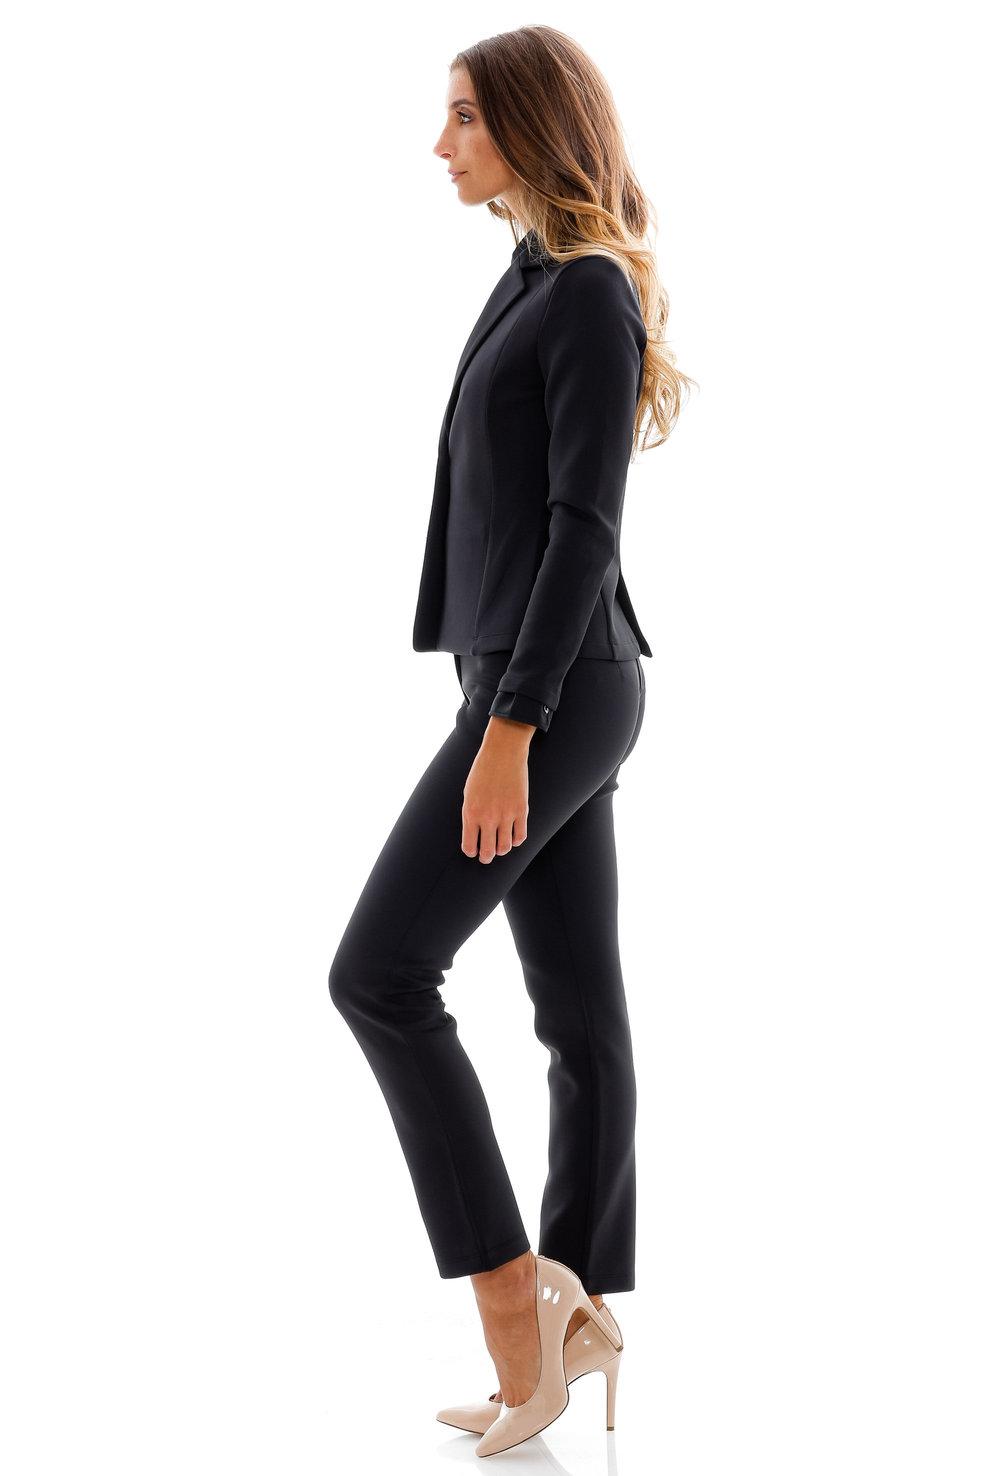 minika-ko-knockout-pant-suit-black.jpg